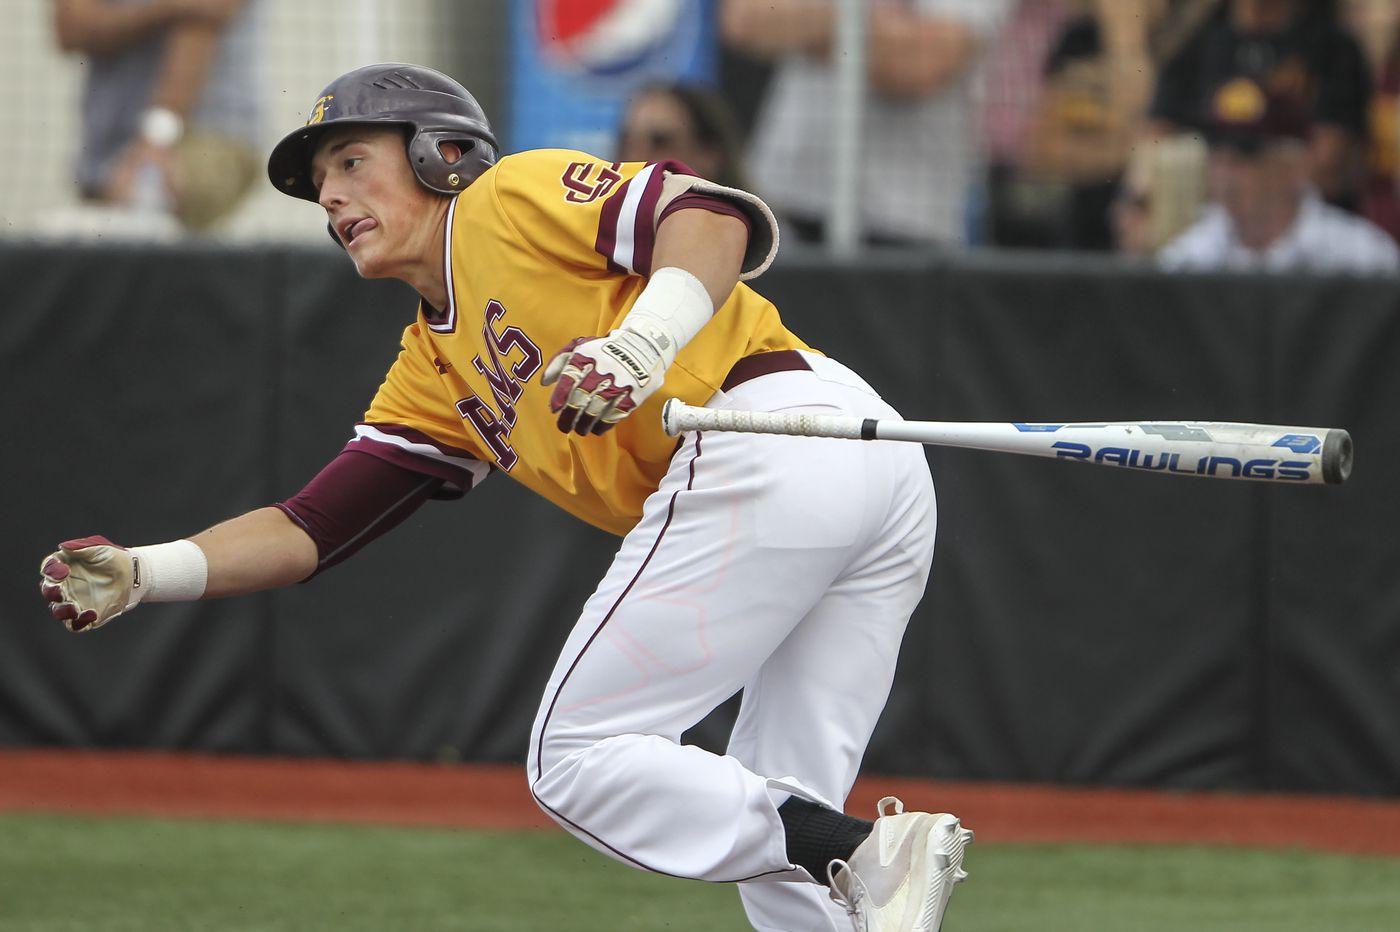 South Jersey baseball state championships at a glance